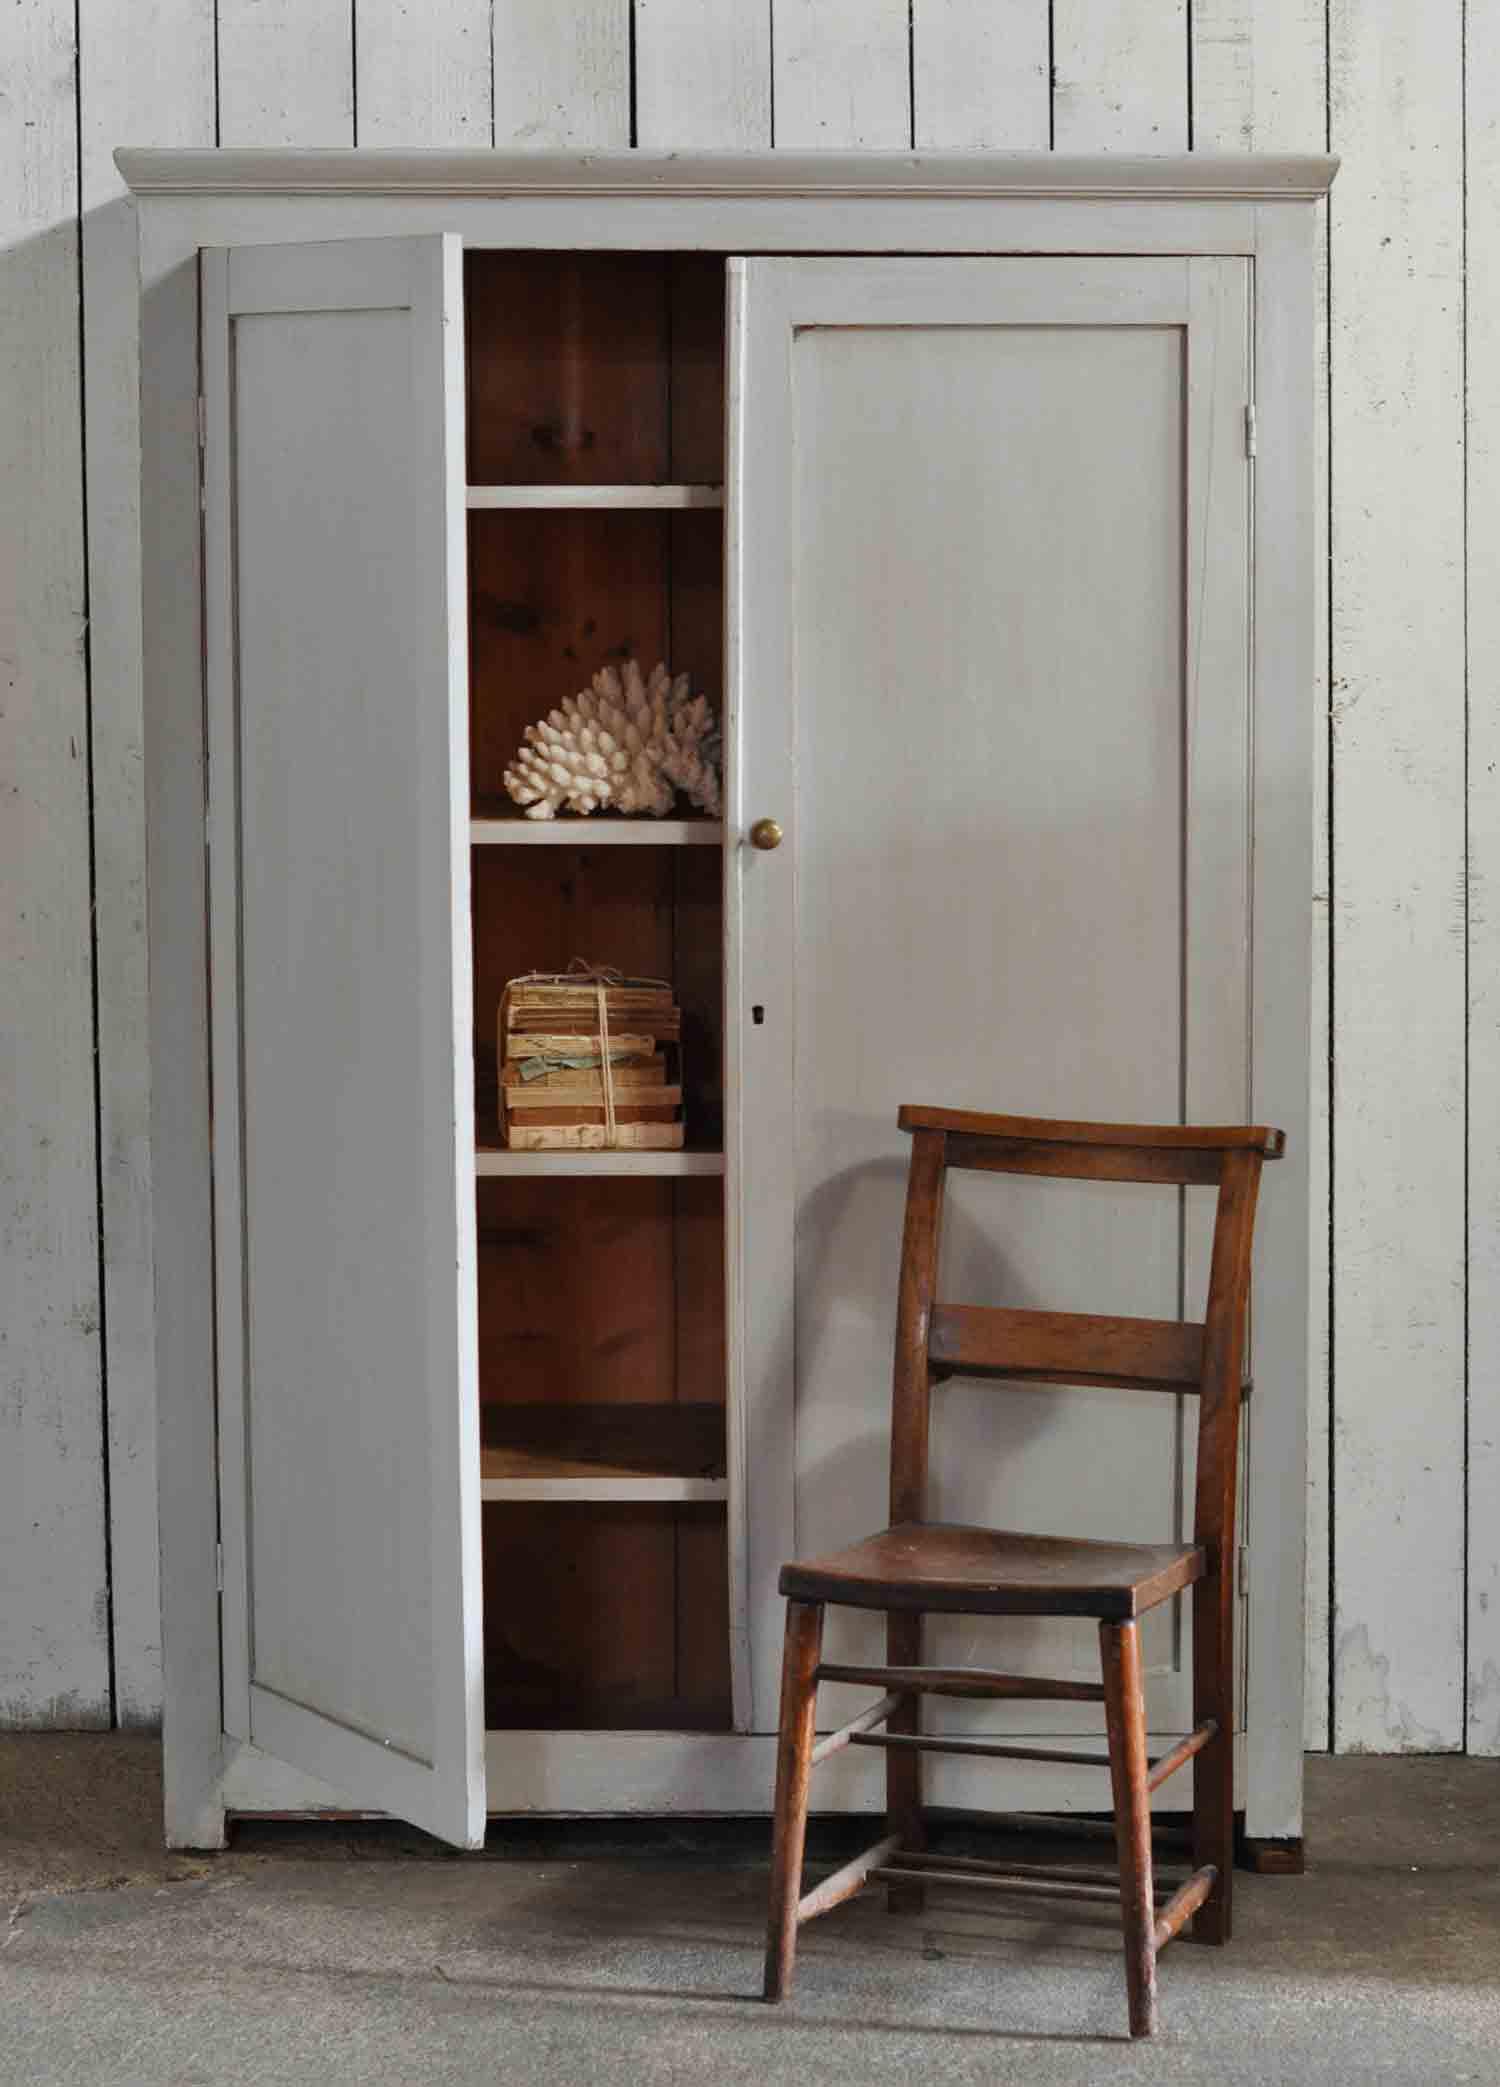 Vintage Painted Two Door School Cupboard Shelves